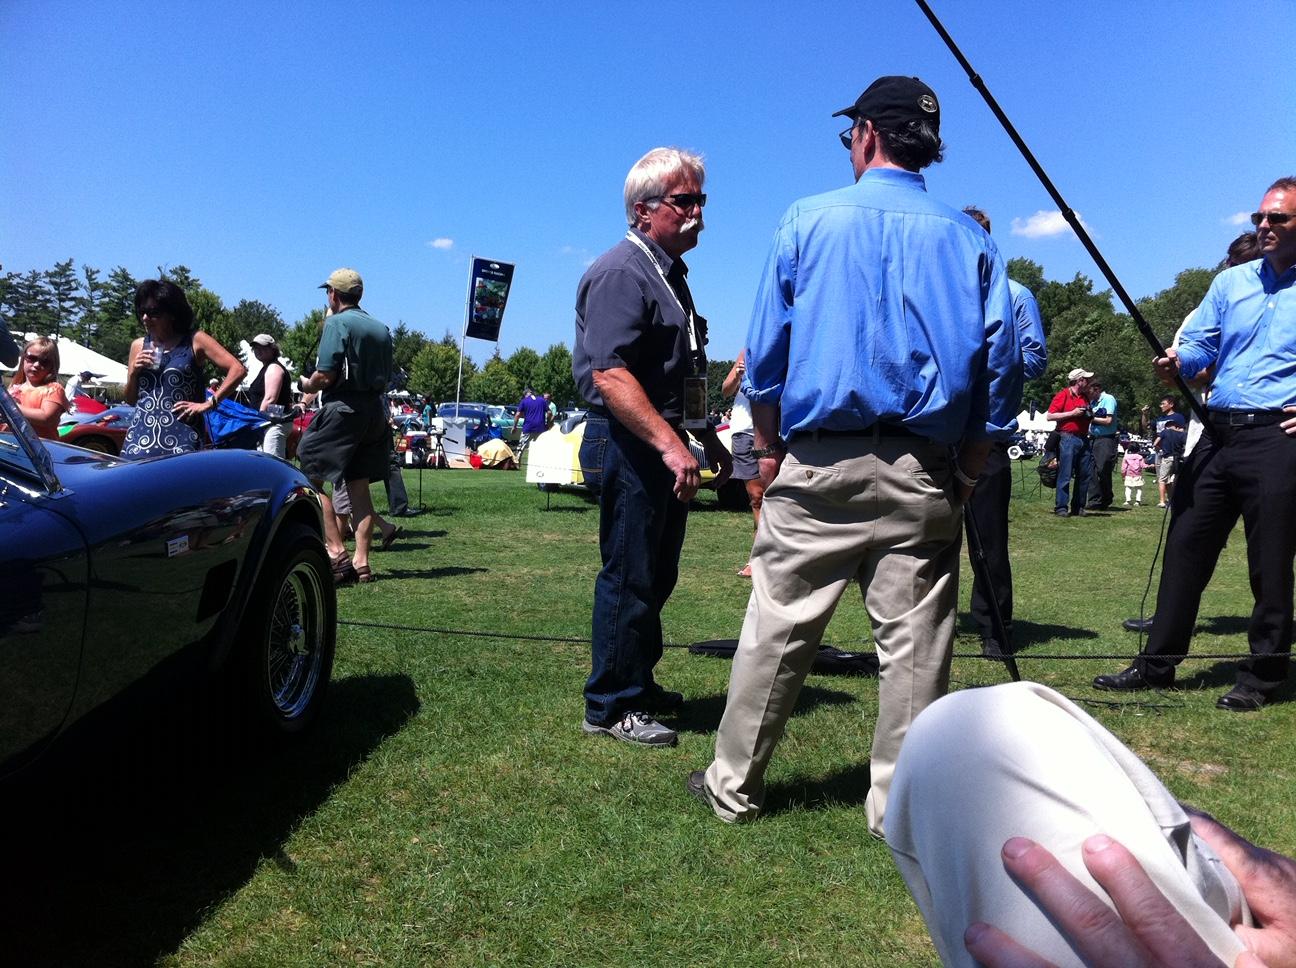 Wayne Carini liked it - Chasing Classic Cars